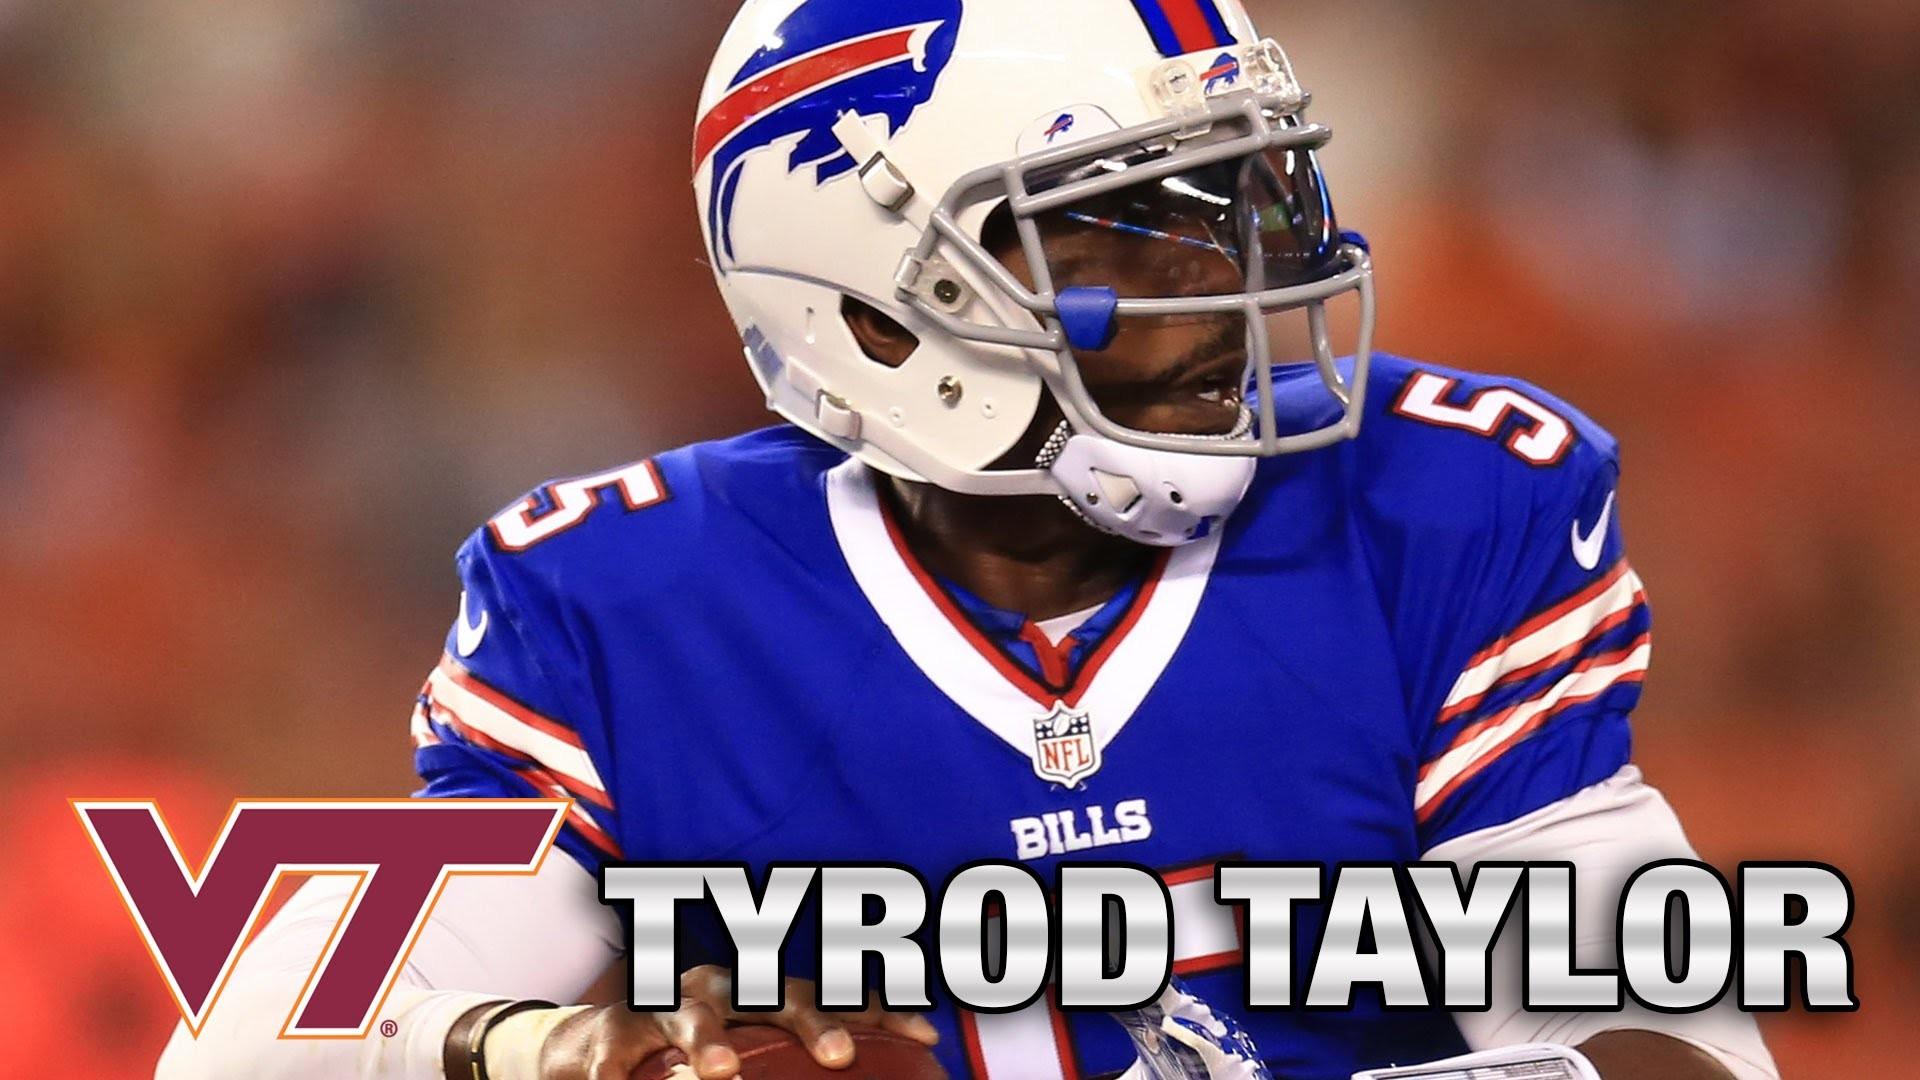 Bills Starting Quarterback Tyrod Taylor's Best Moments at Virginia Tech –  YouTube